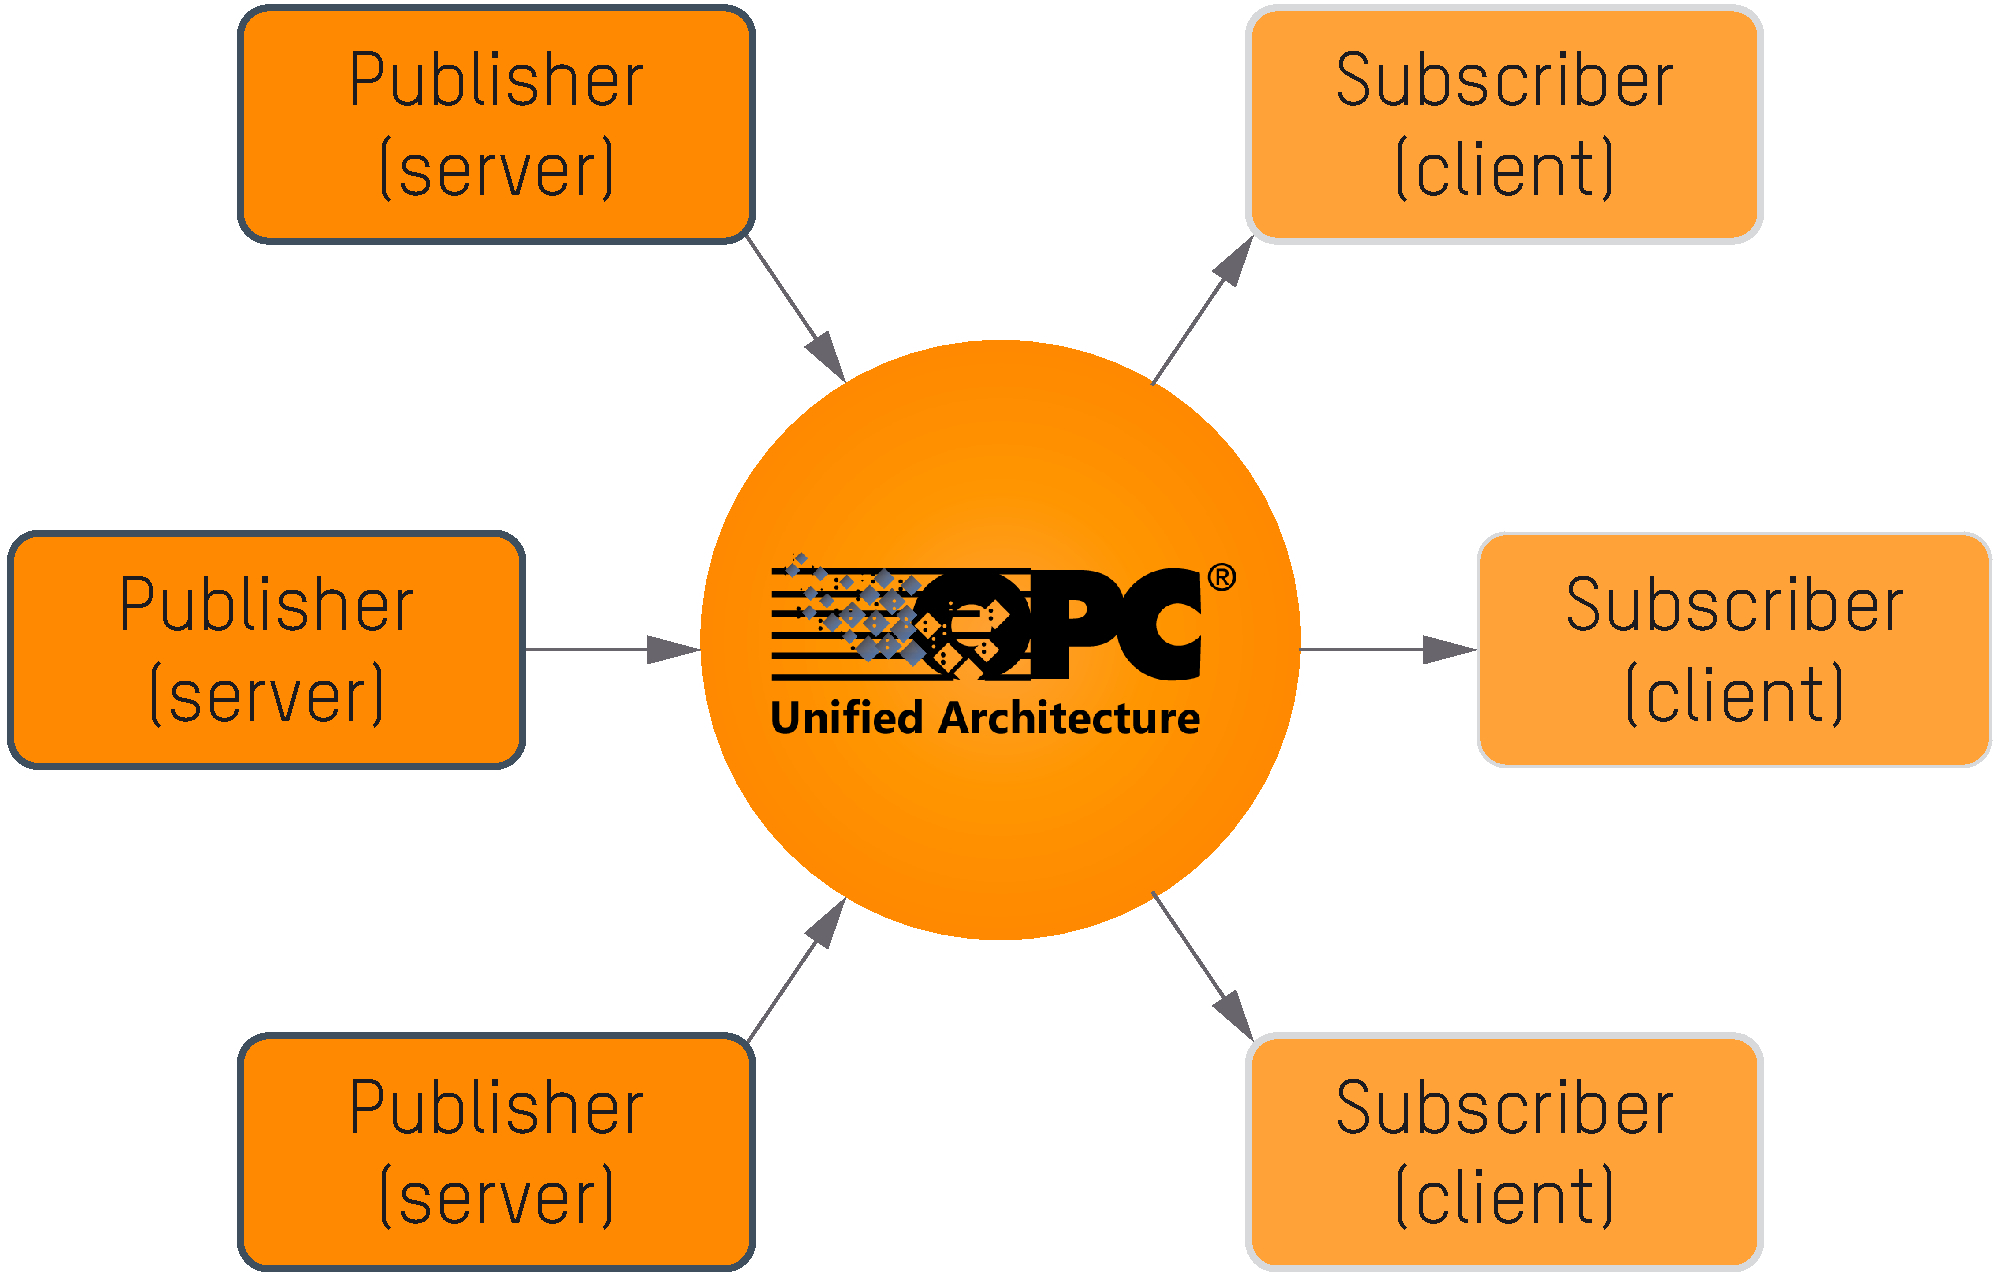 File:OPC-UA-Publish-Subscribe jpg - Wikimedia Commons